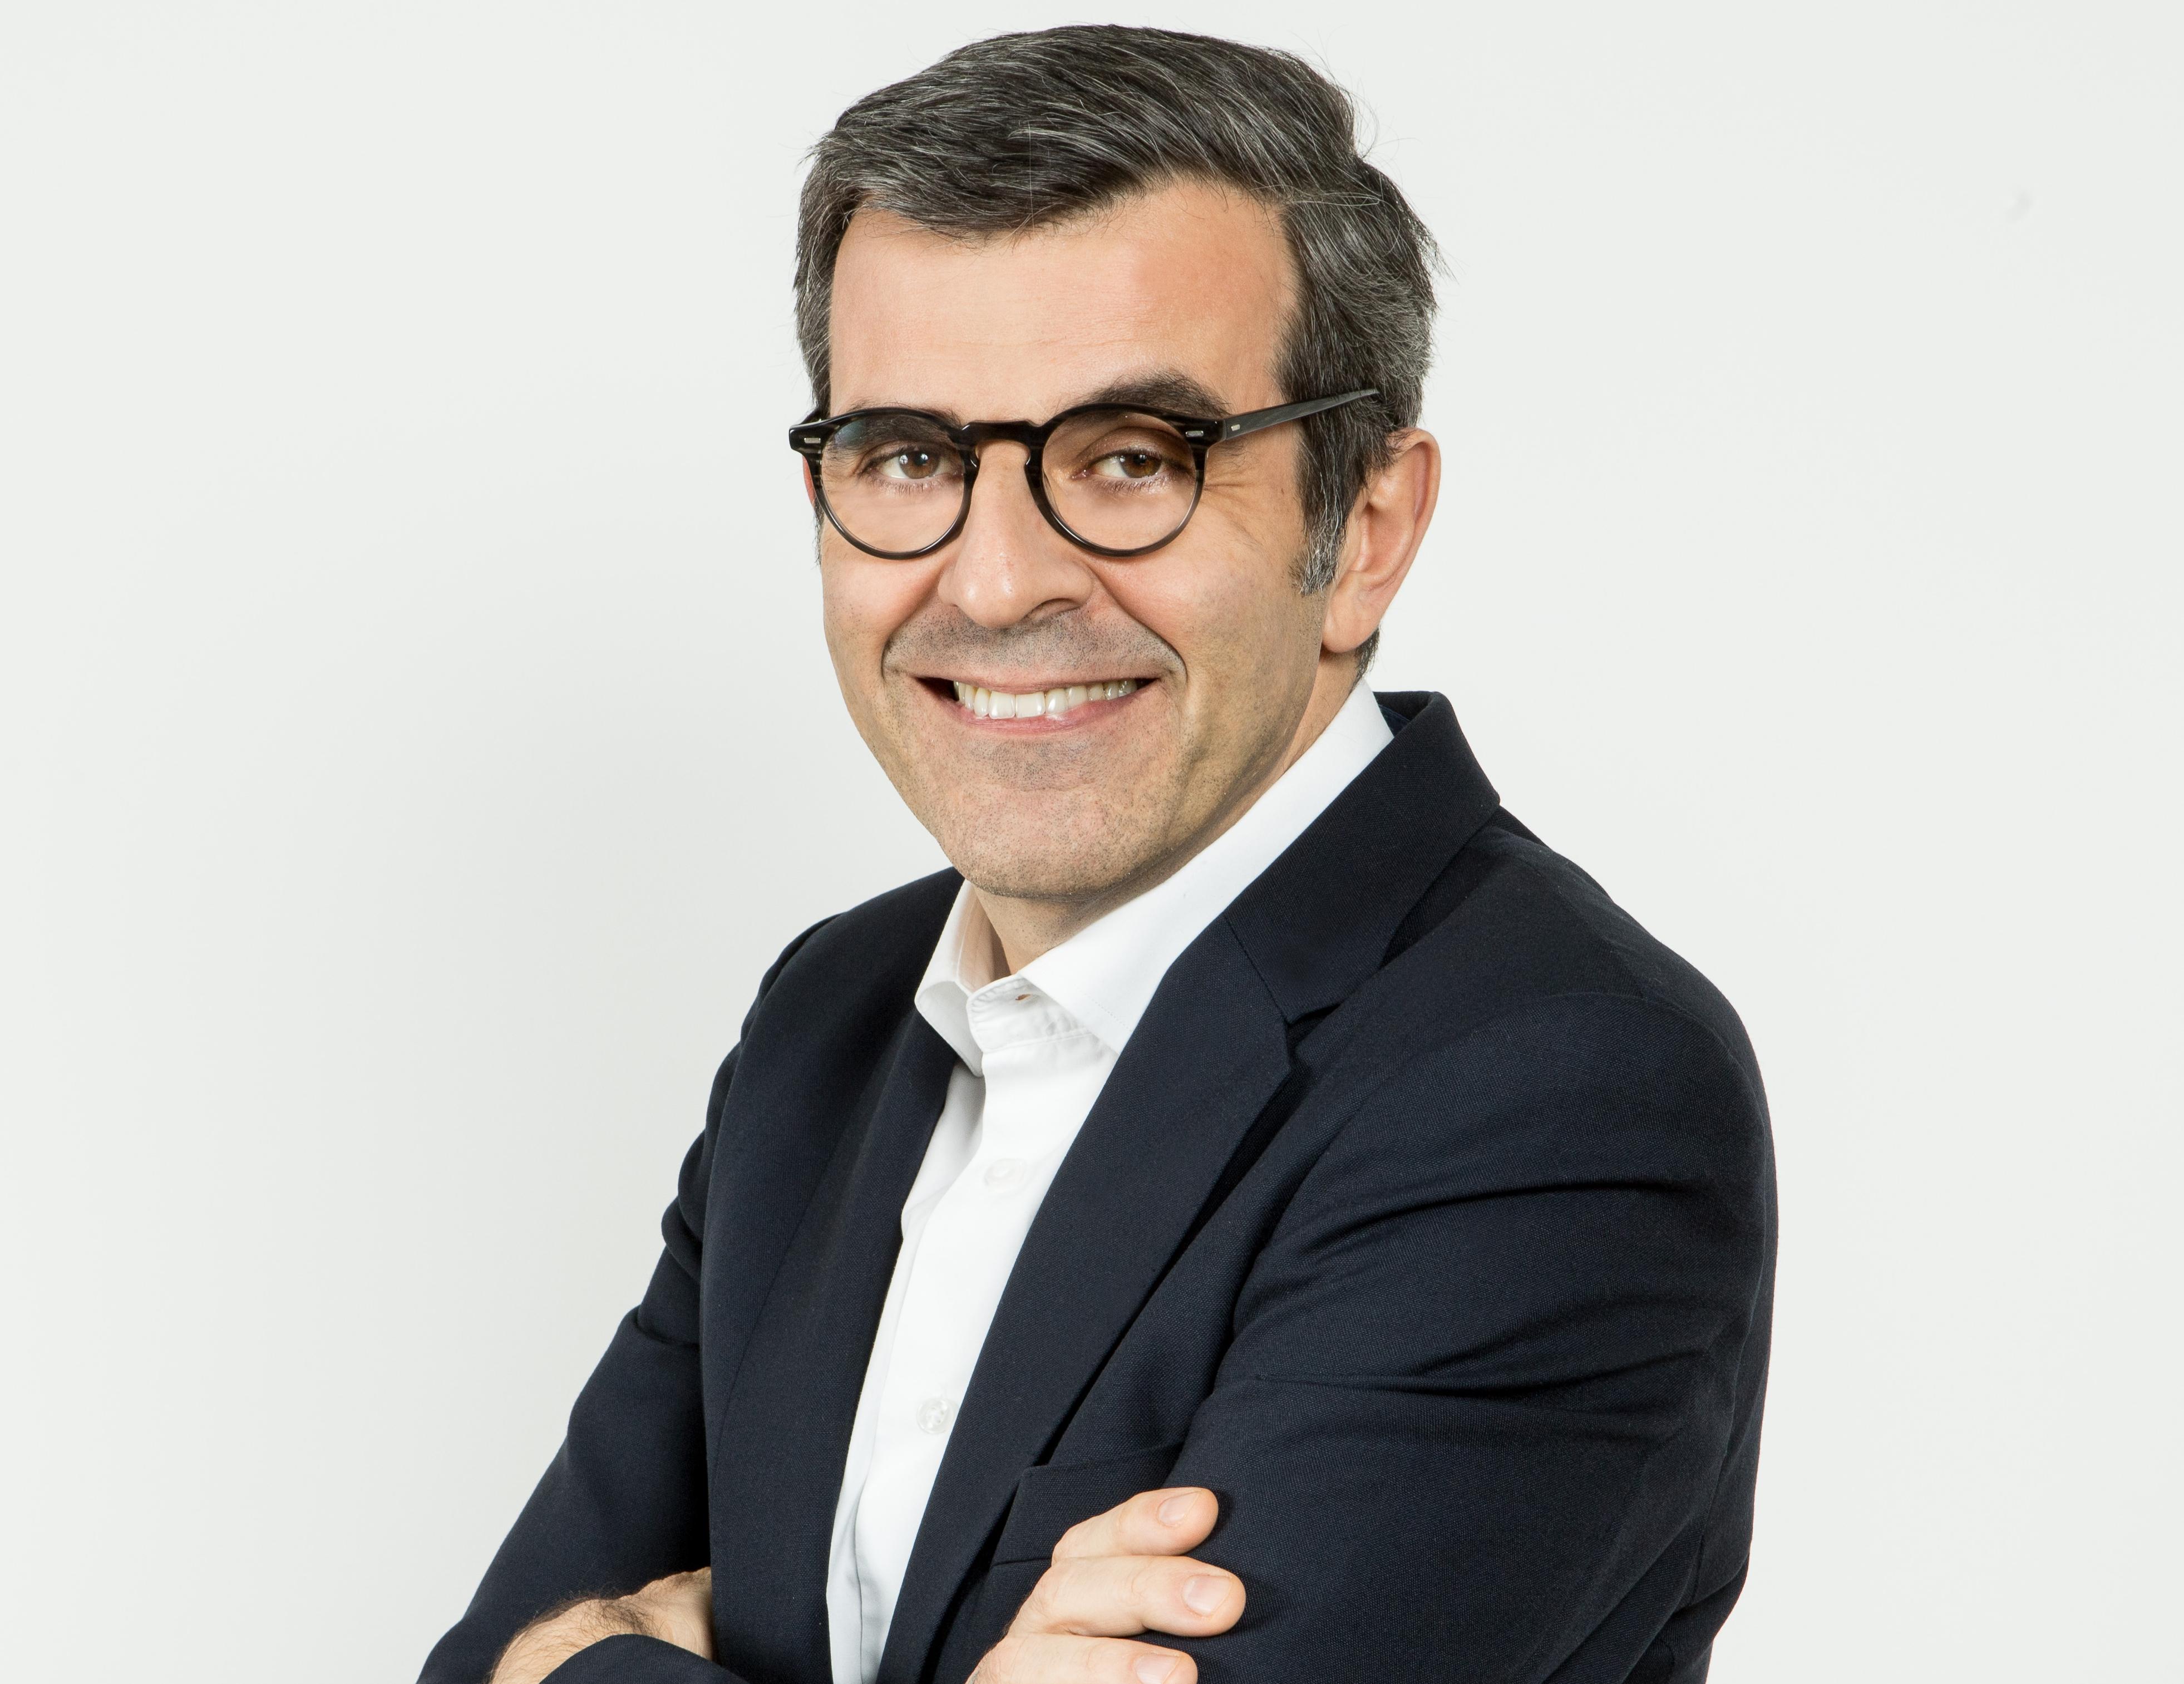 Philippe Klocanas, Weinberg Capital Partners